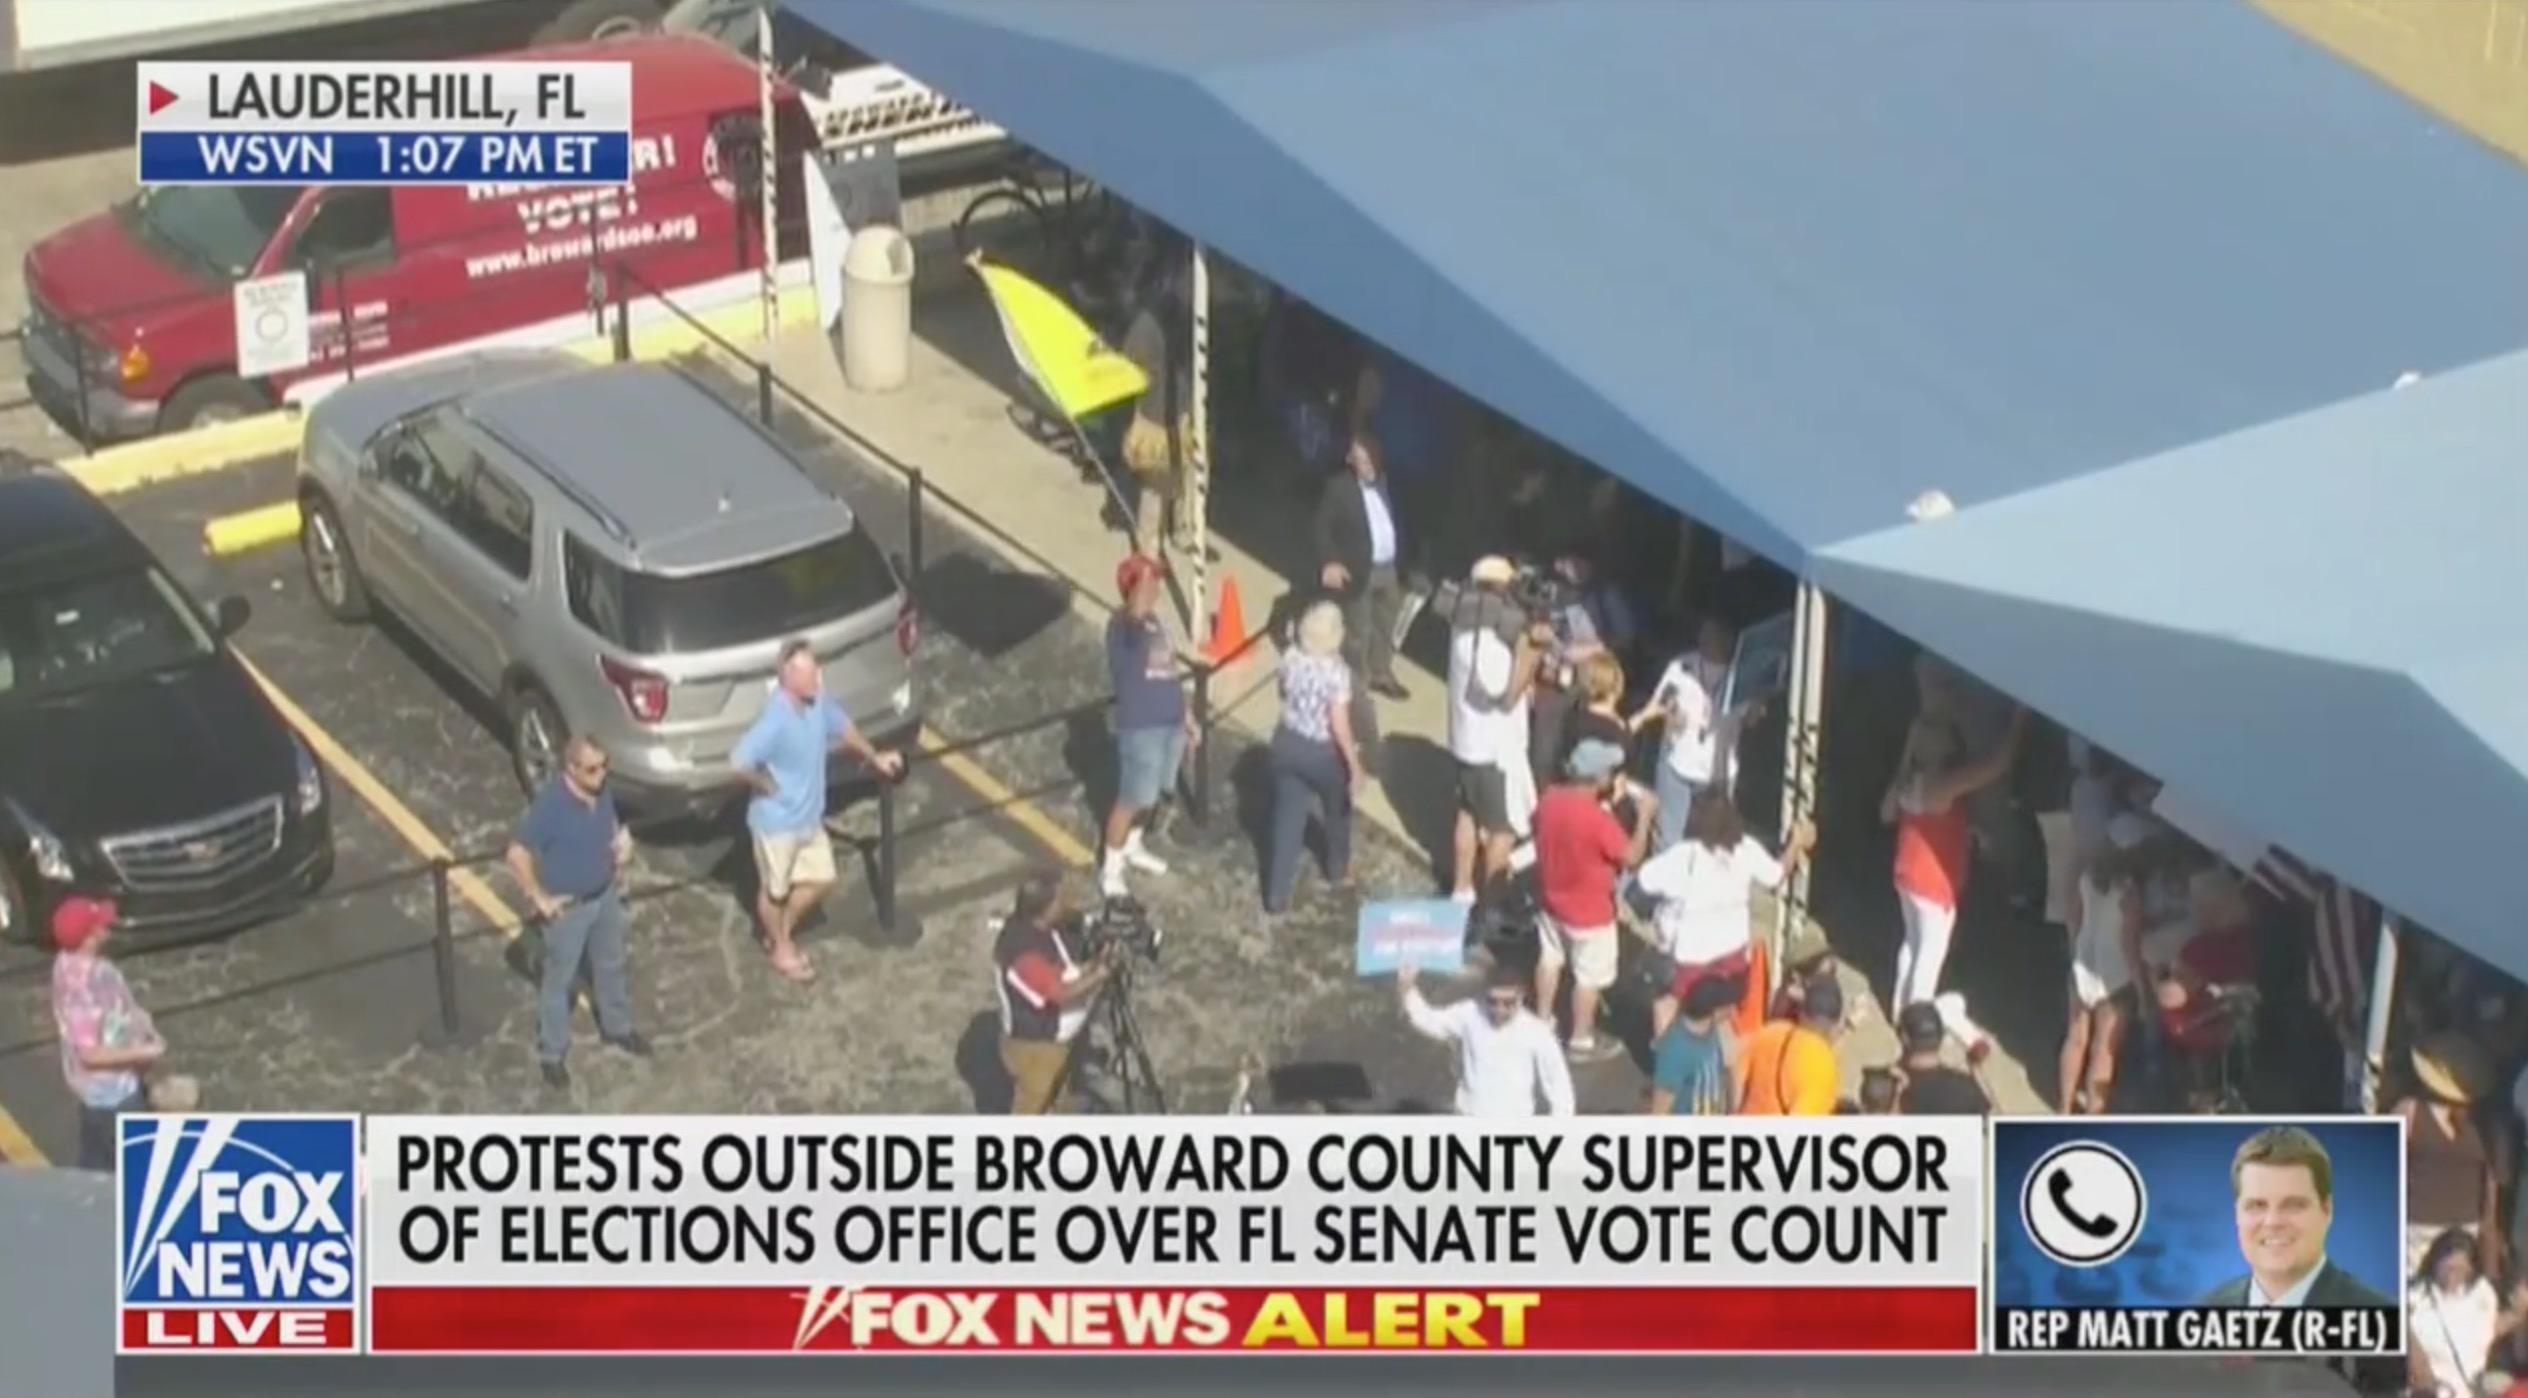 WATCH: Matt Gaetz Goes Off on 'Banana Republic of Broward Country' in Zany Fox News Rant